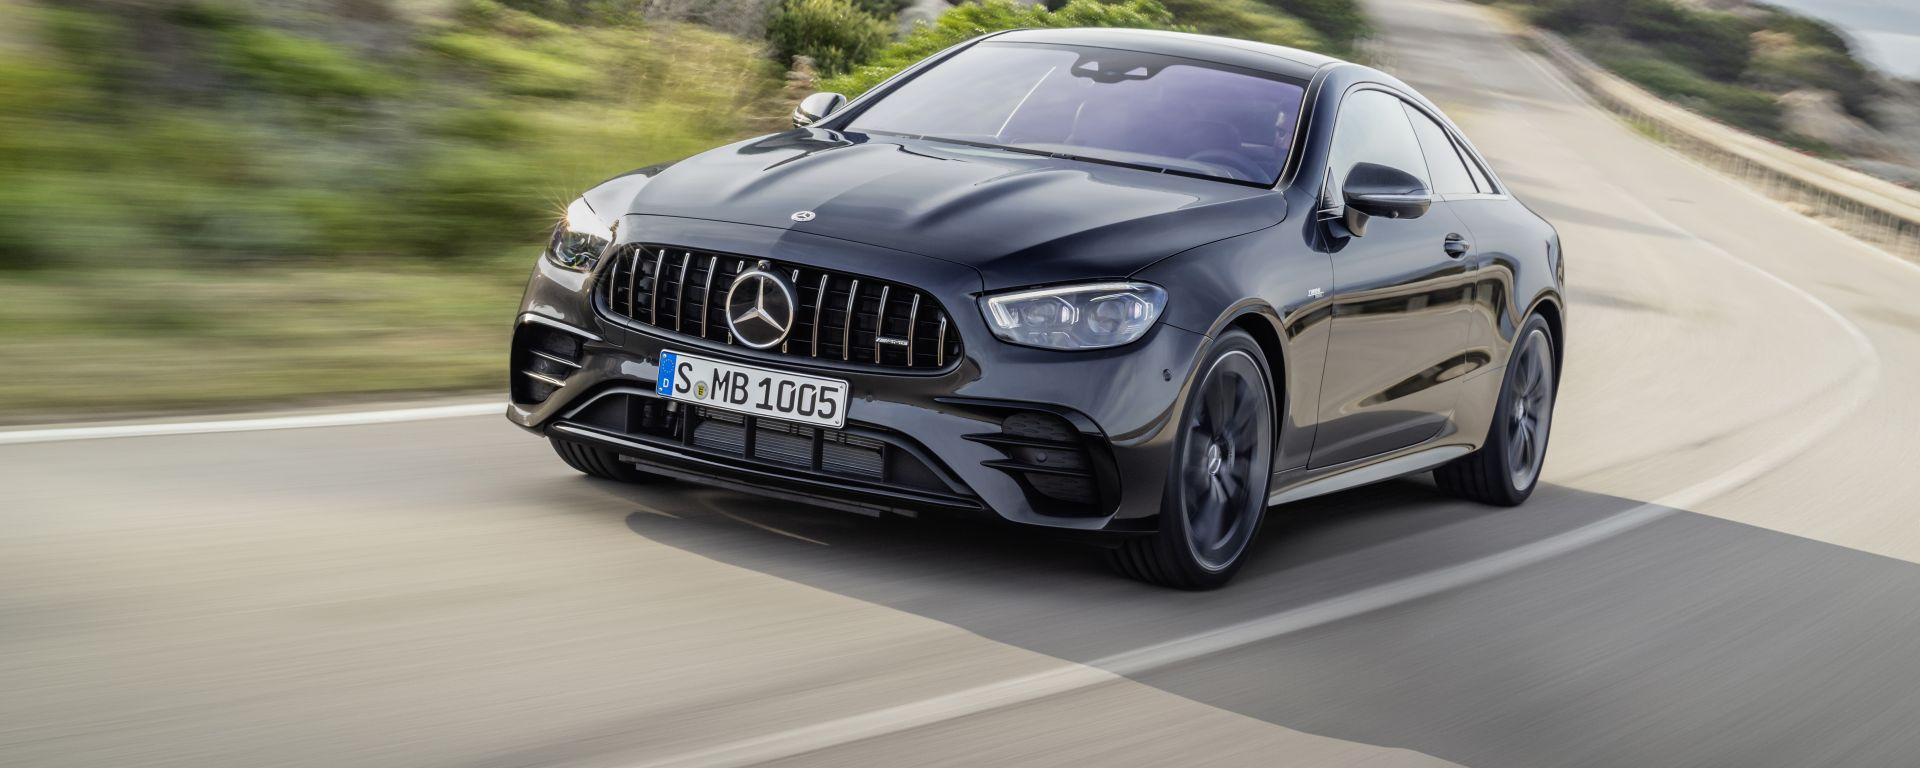 Mercedes Classe E Coupé e Cabrio 2020, mild hybrid la parola d'ordine